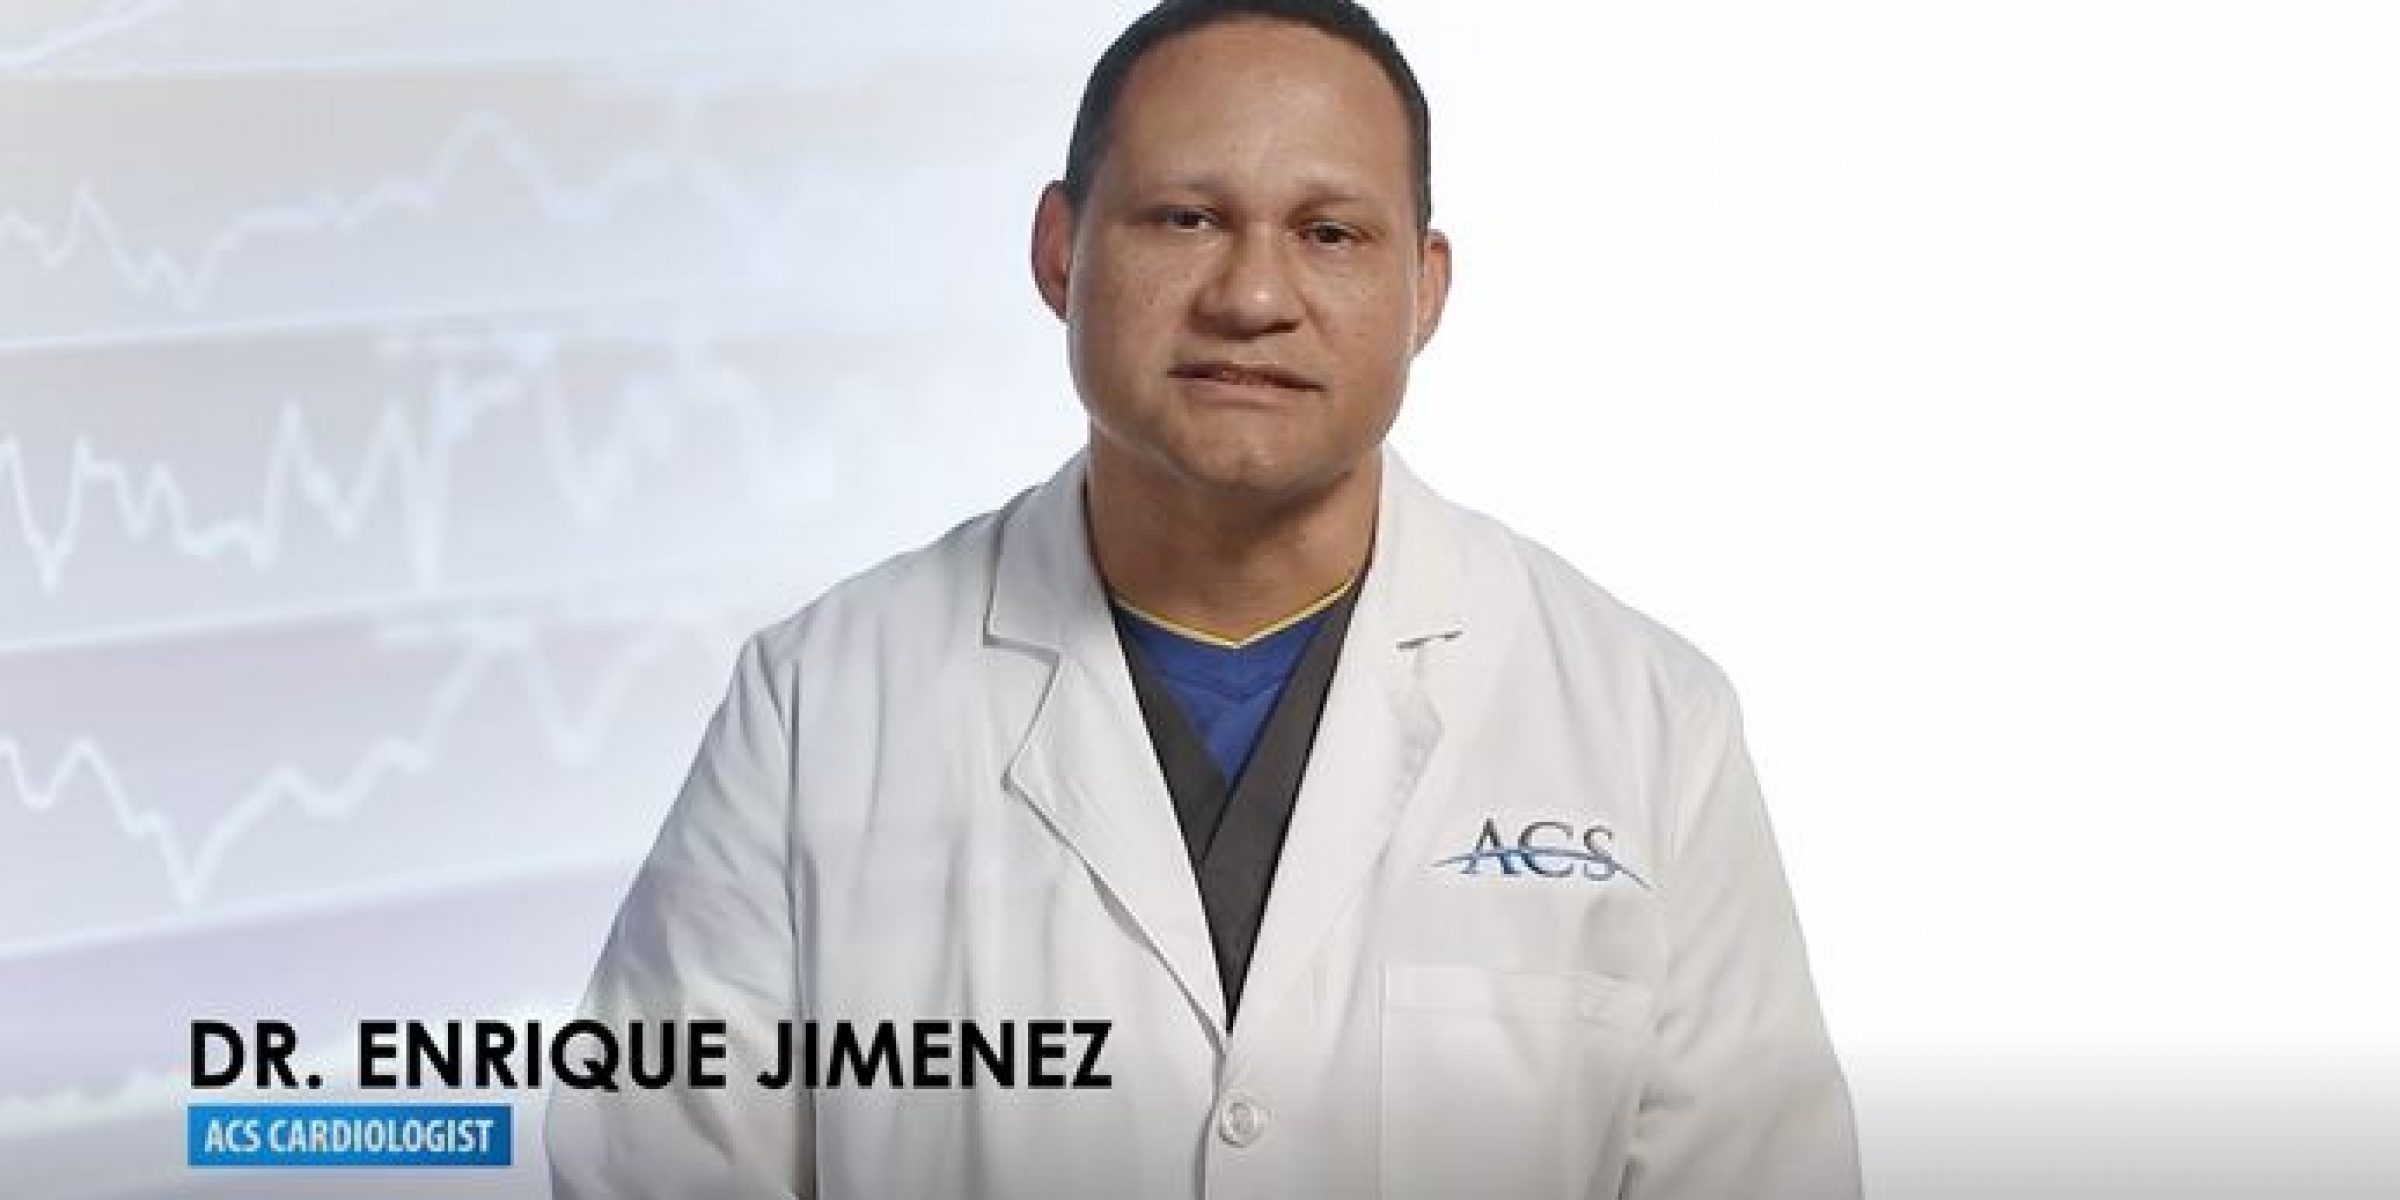 Cardiologist, Shreveport Cardiologist, Advanced Cardiovascular Specialists, Dr. Enrique Jimenez, Snoring, Heart Disease